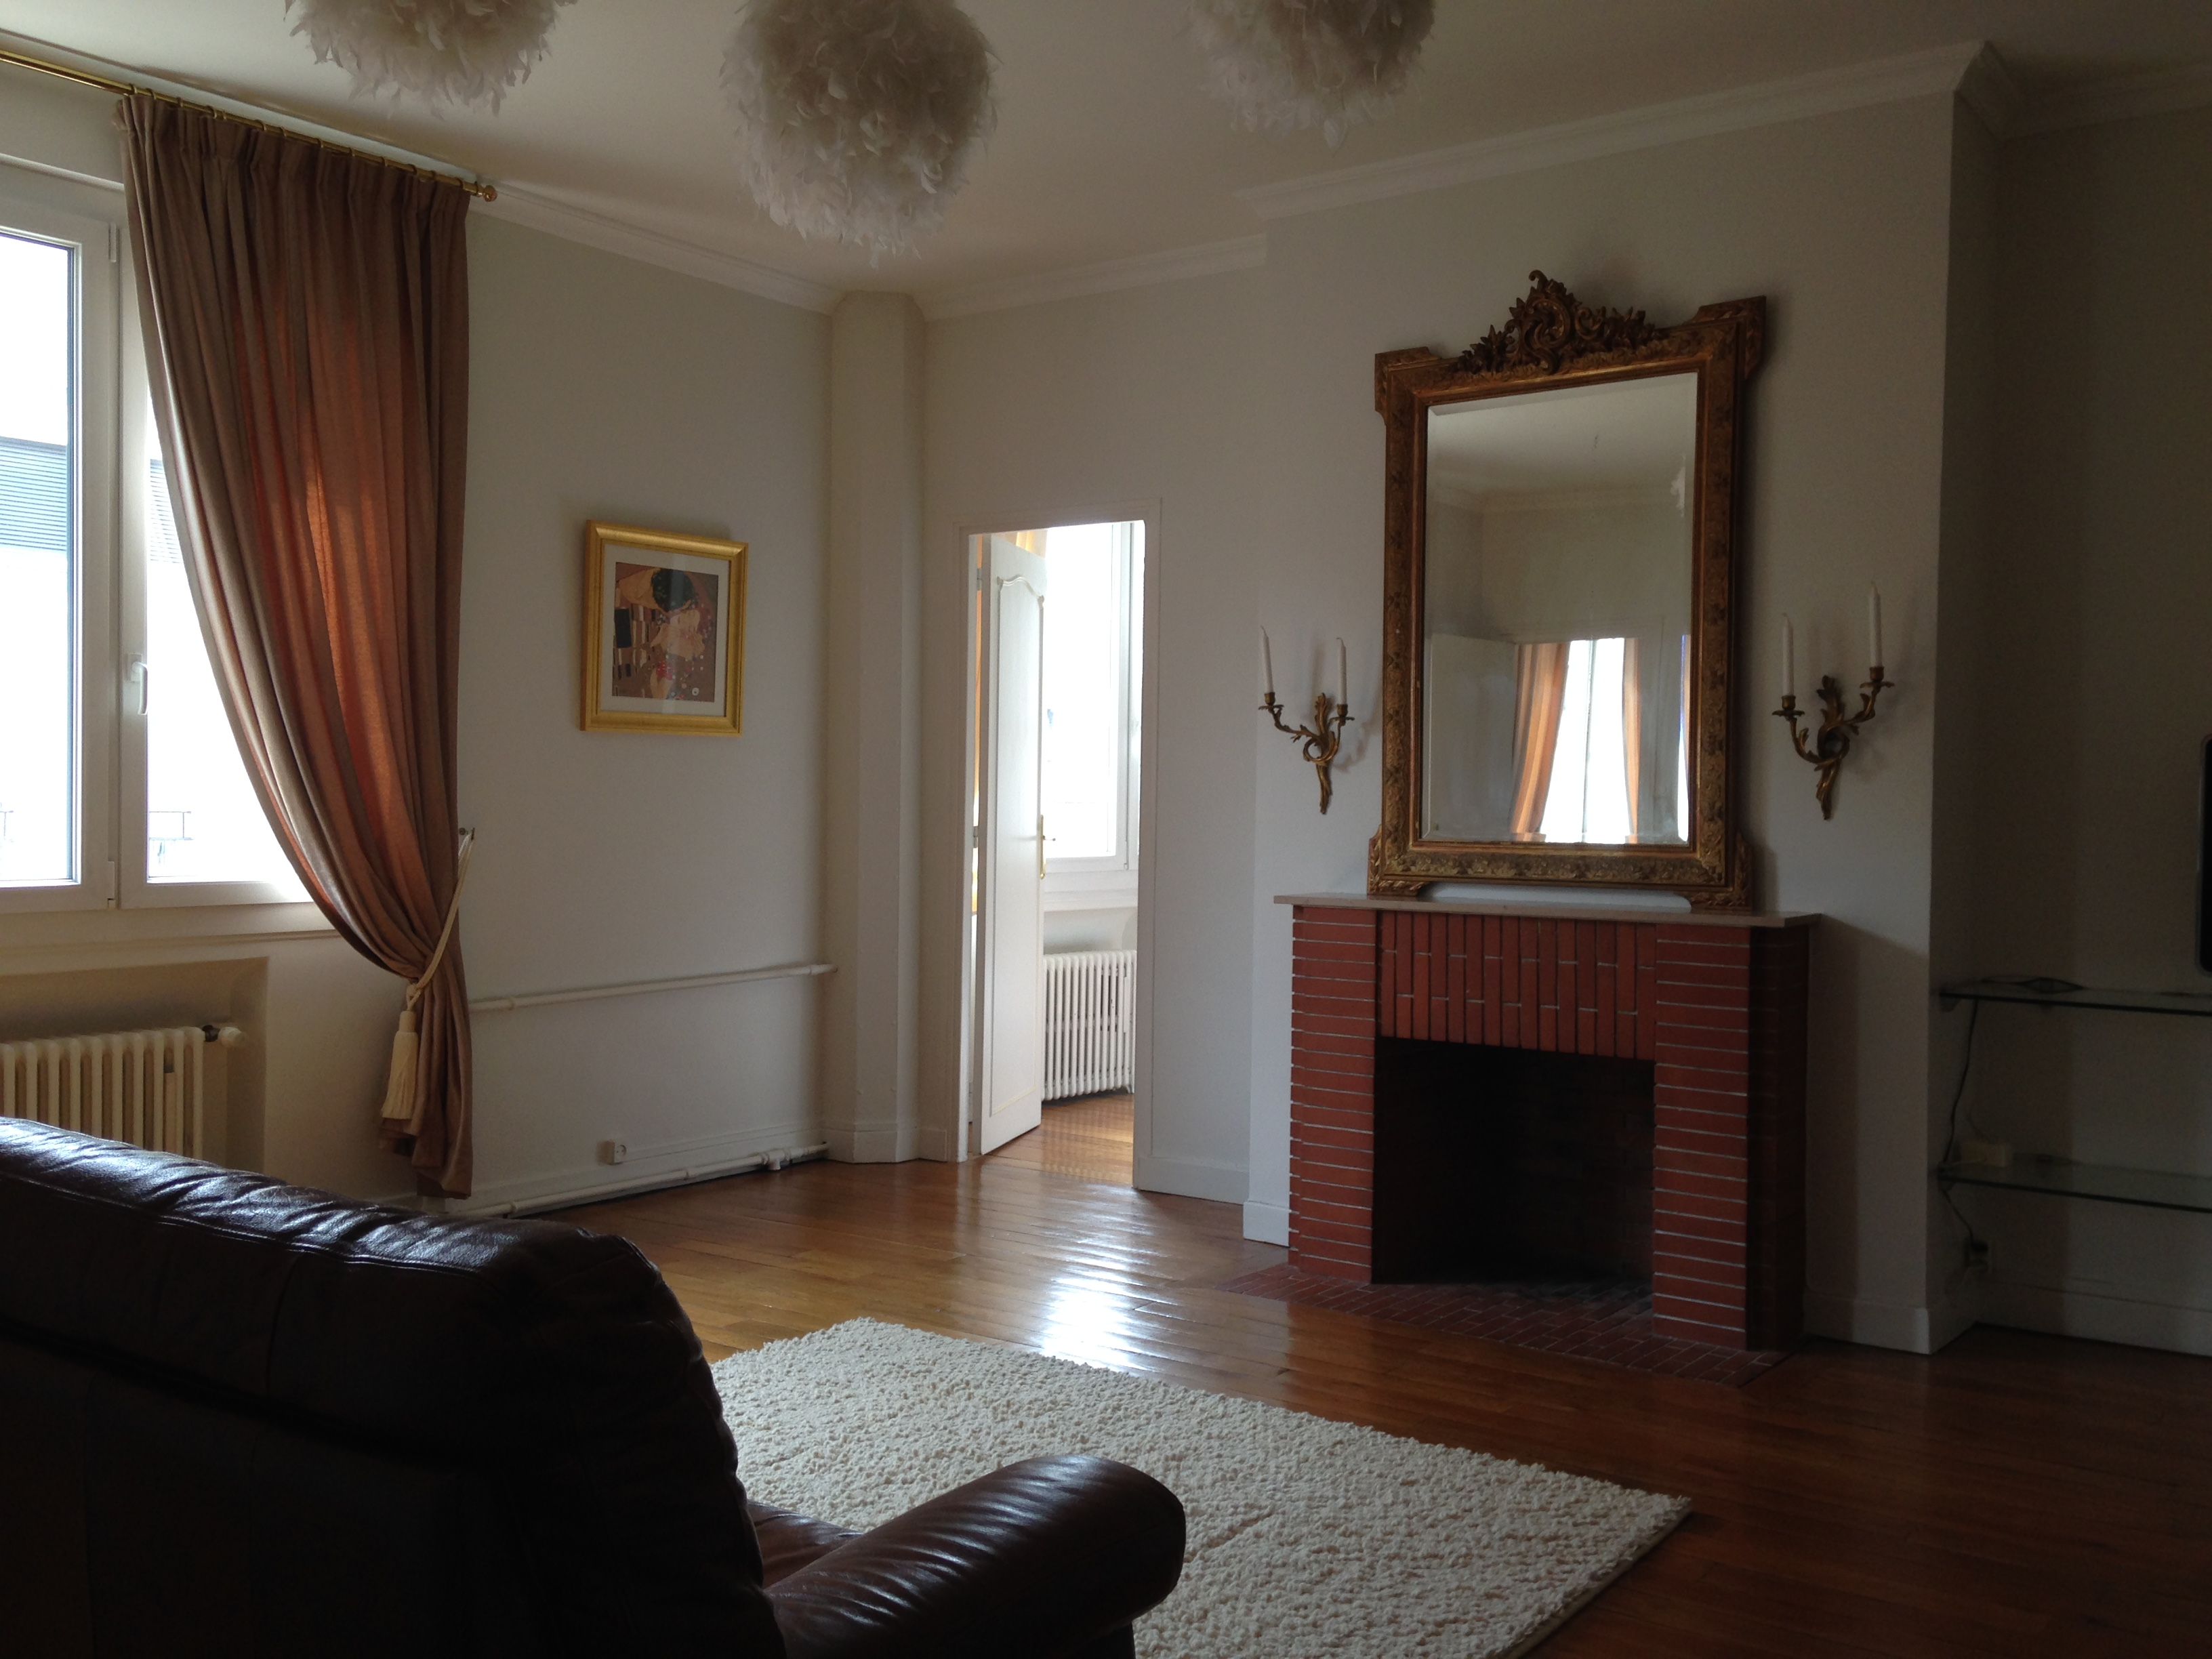 Appartement Amiens - 4 personnes - location vacances  n°54624